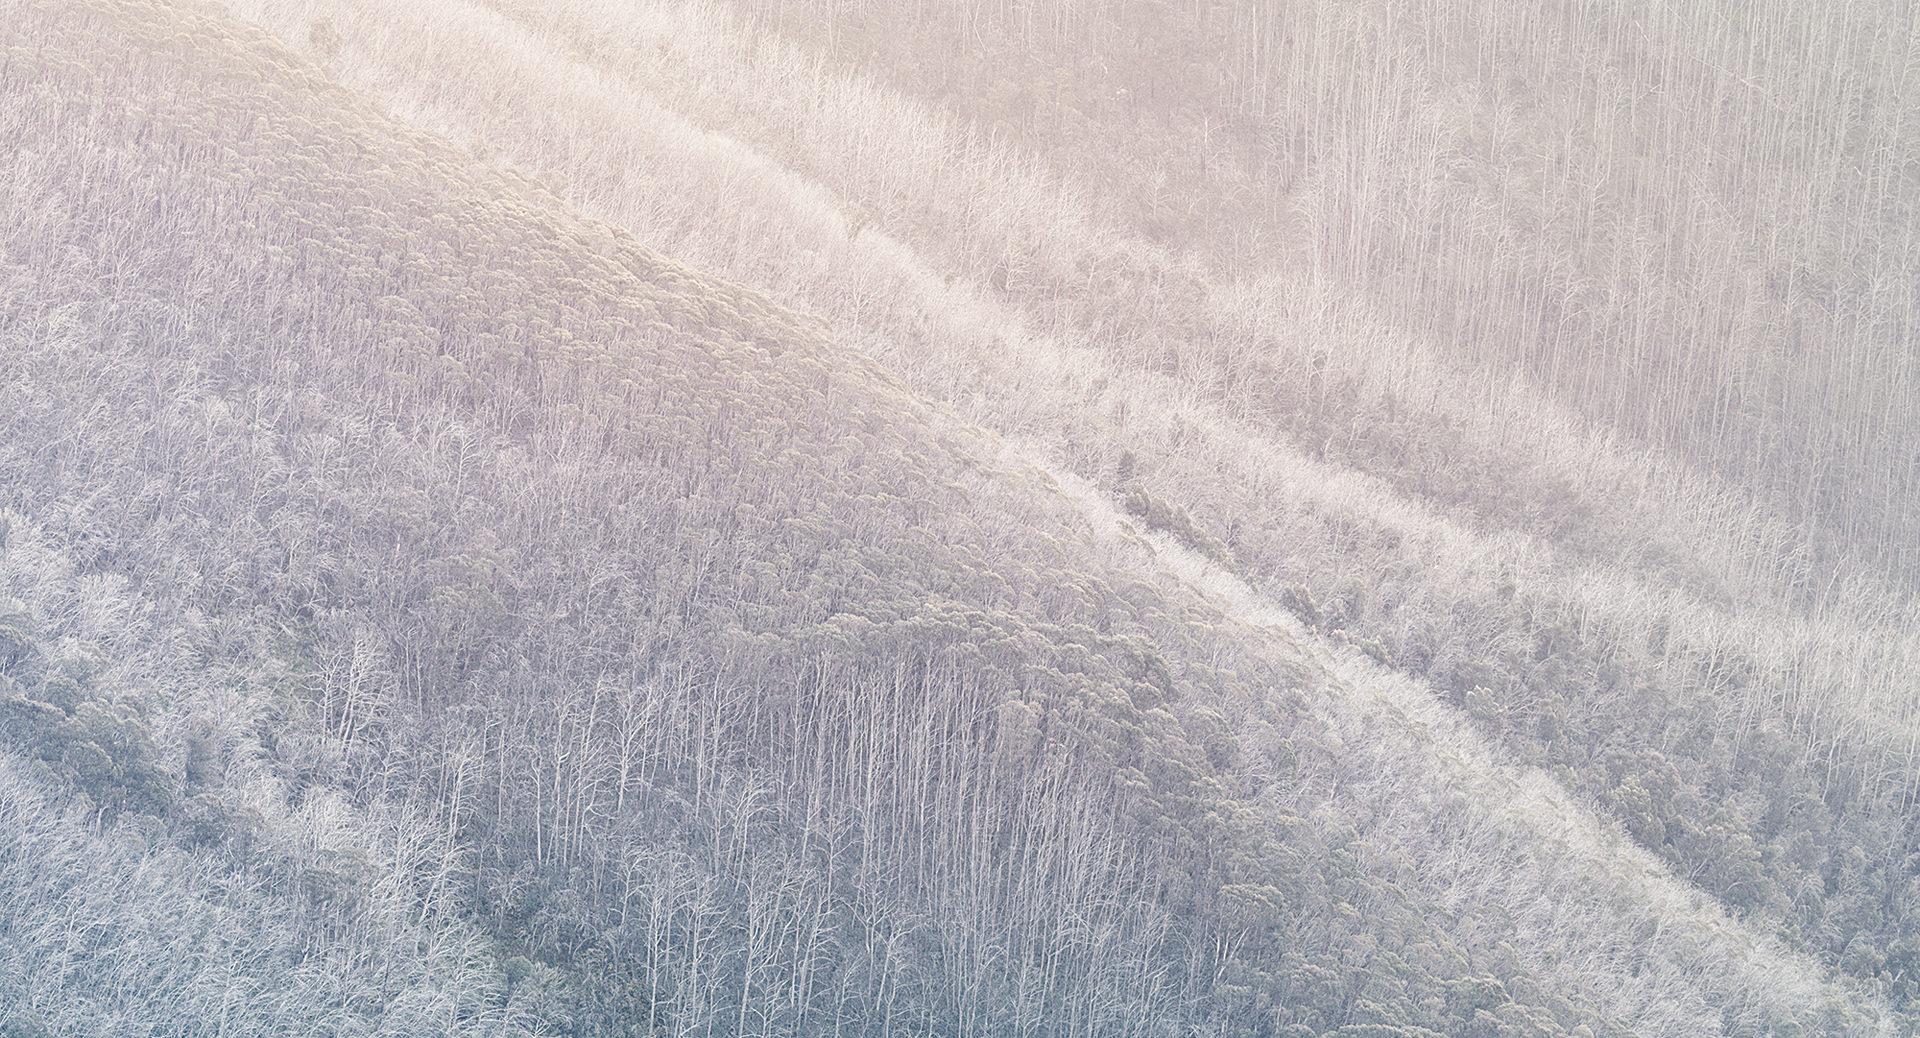 ©ankeluckmann1554p, landscape,mountain, white, elisabeth winter, anke luckmann, www.ankeluckmann.com